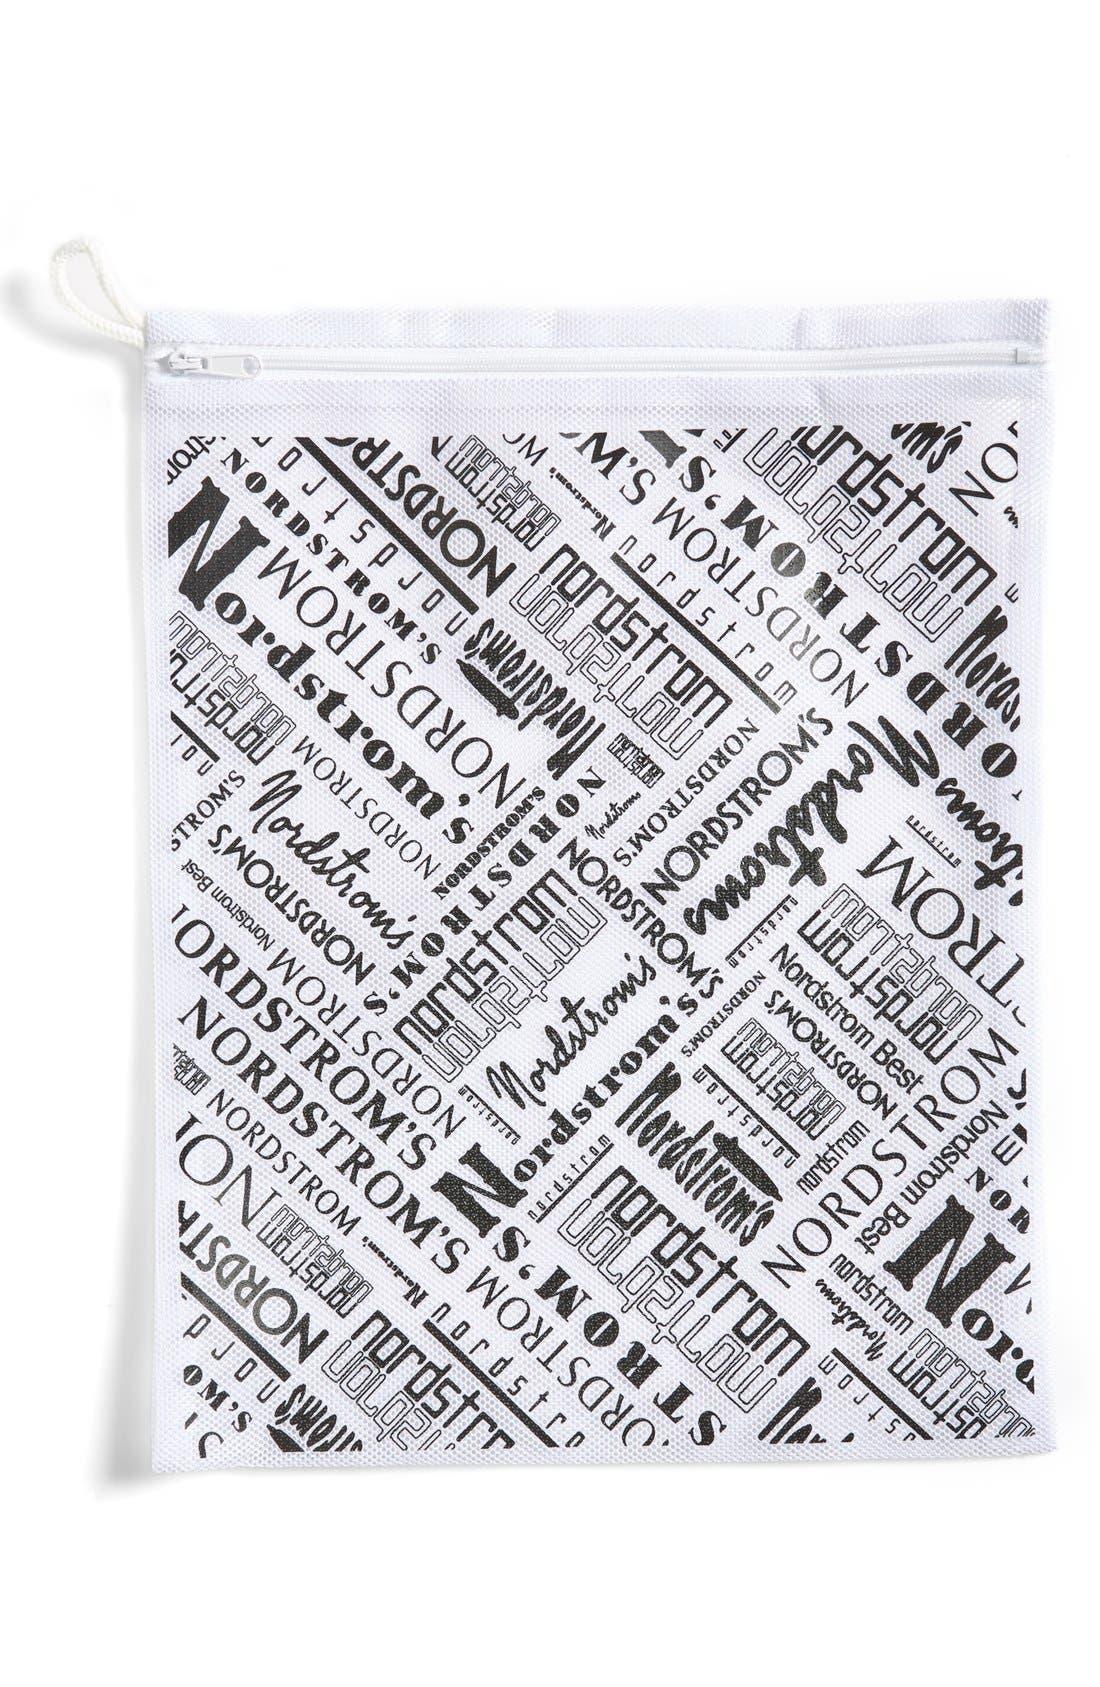 Main Image - Nordstrom Intimates Mesh Zip Laundry Wash Bag